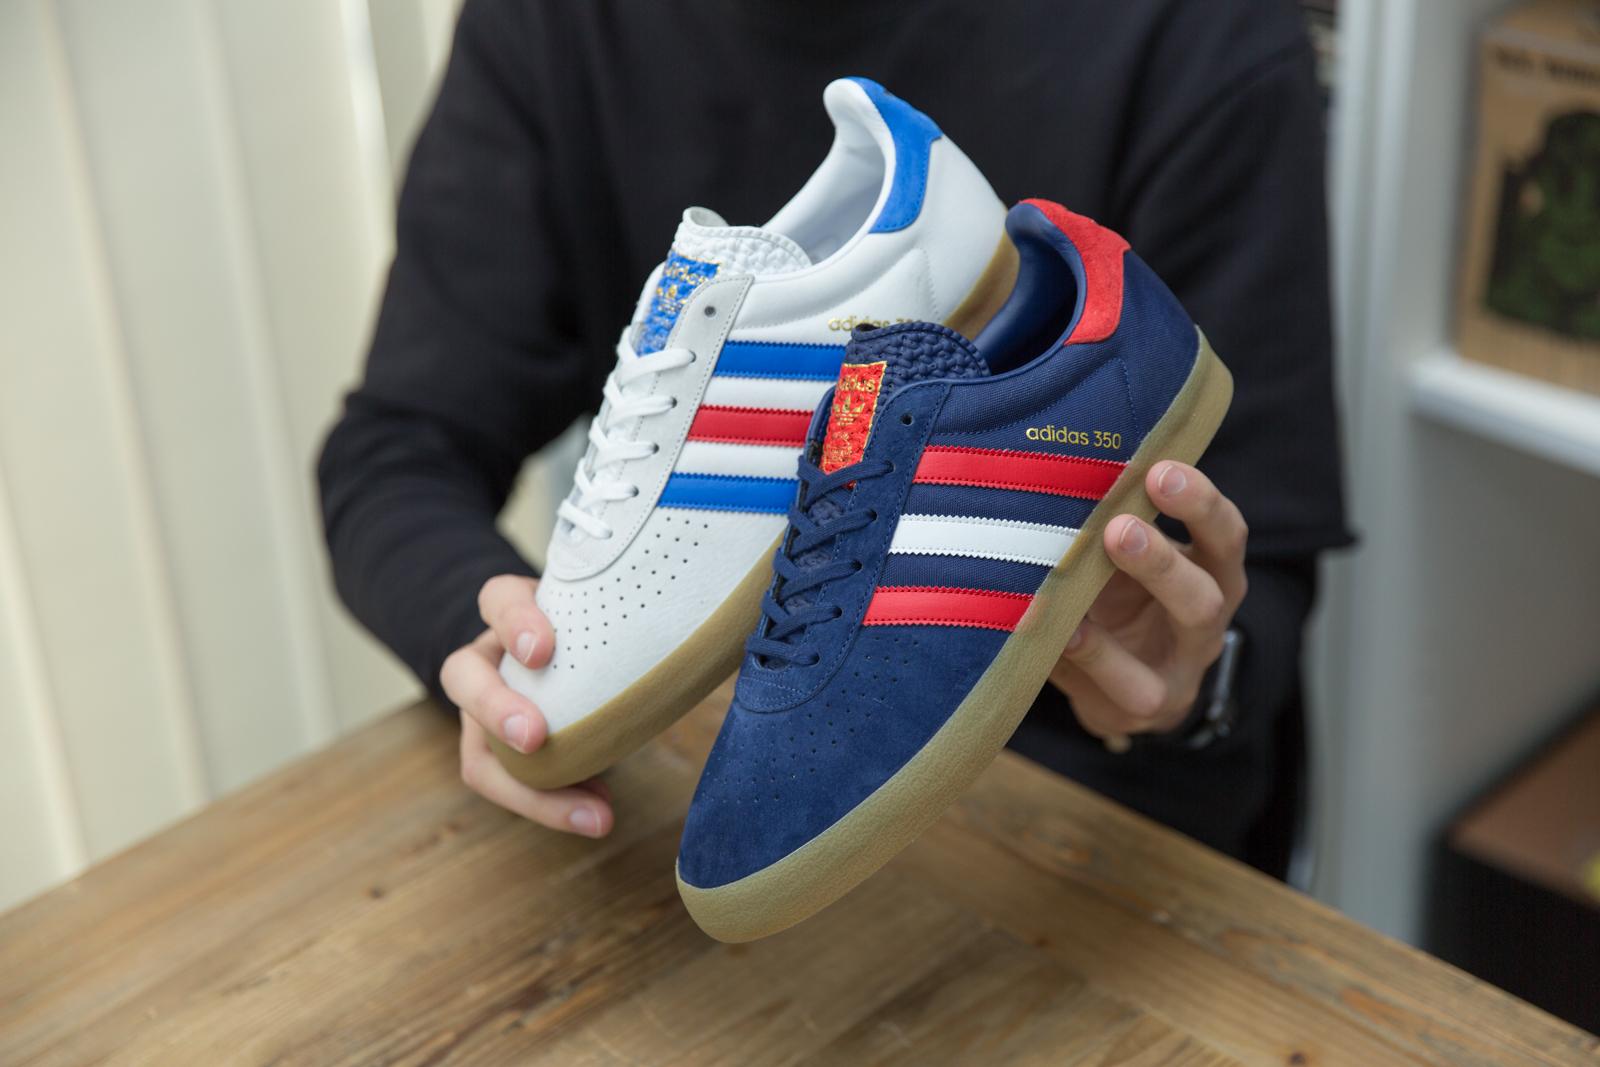 adidas Originals Archive 350 – size? Exclusive